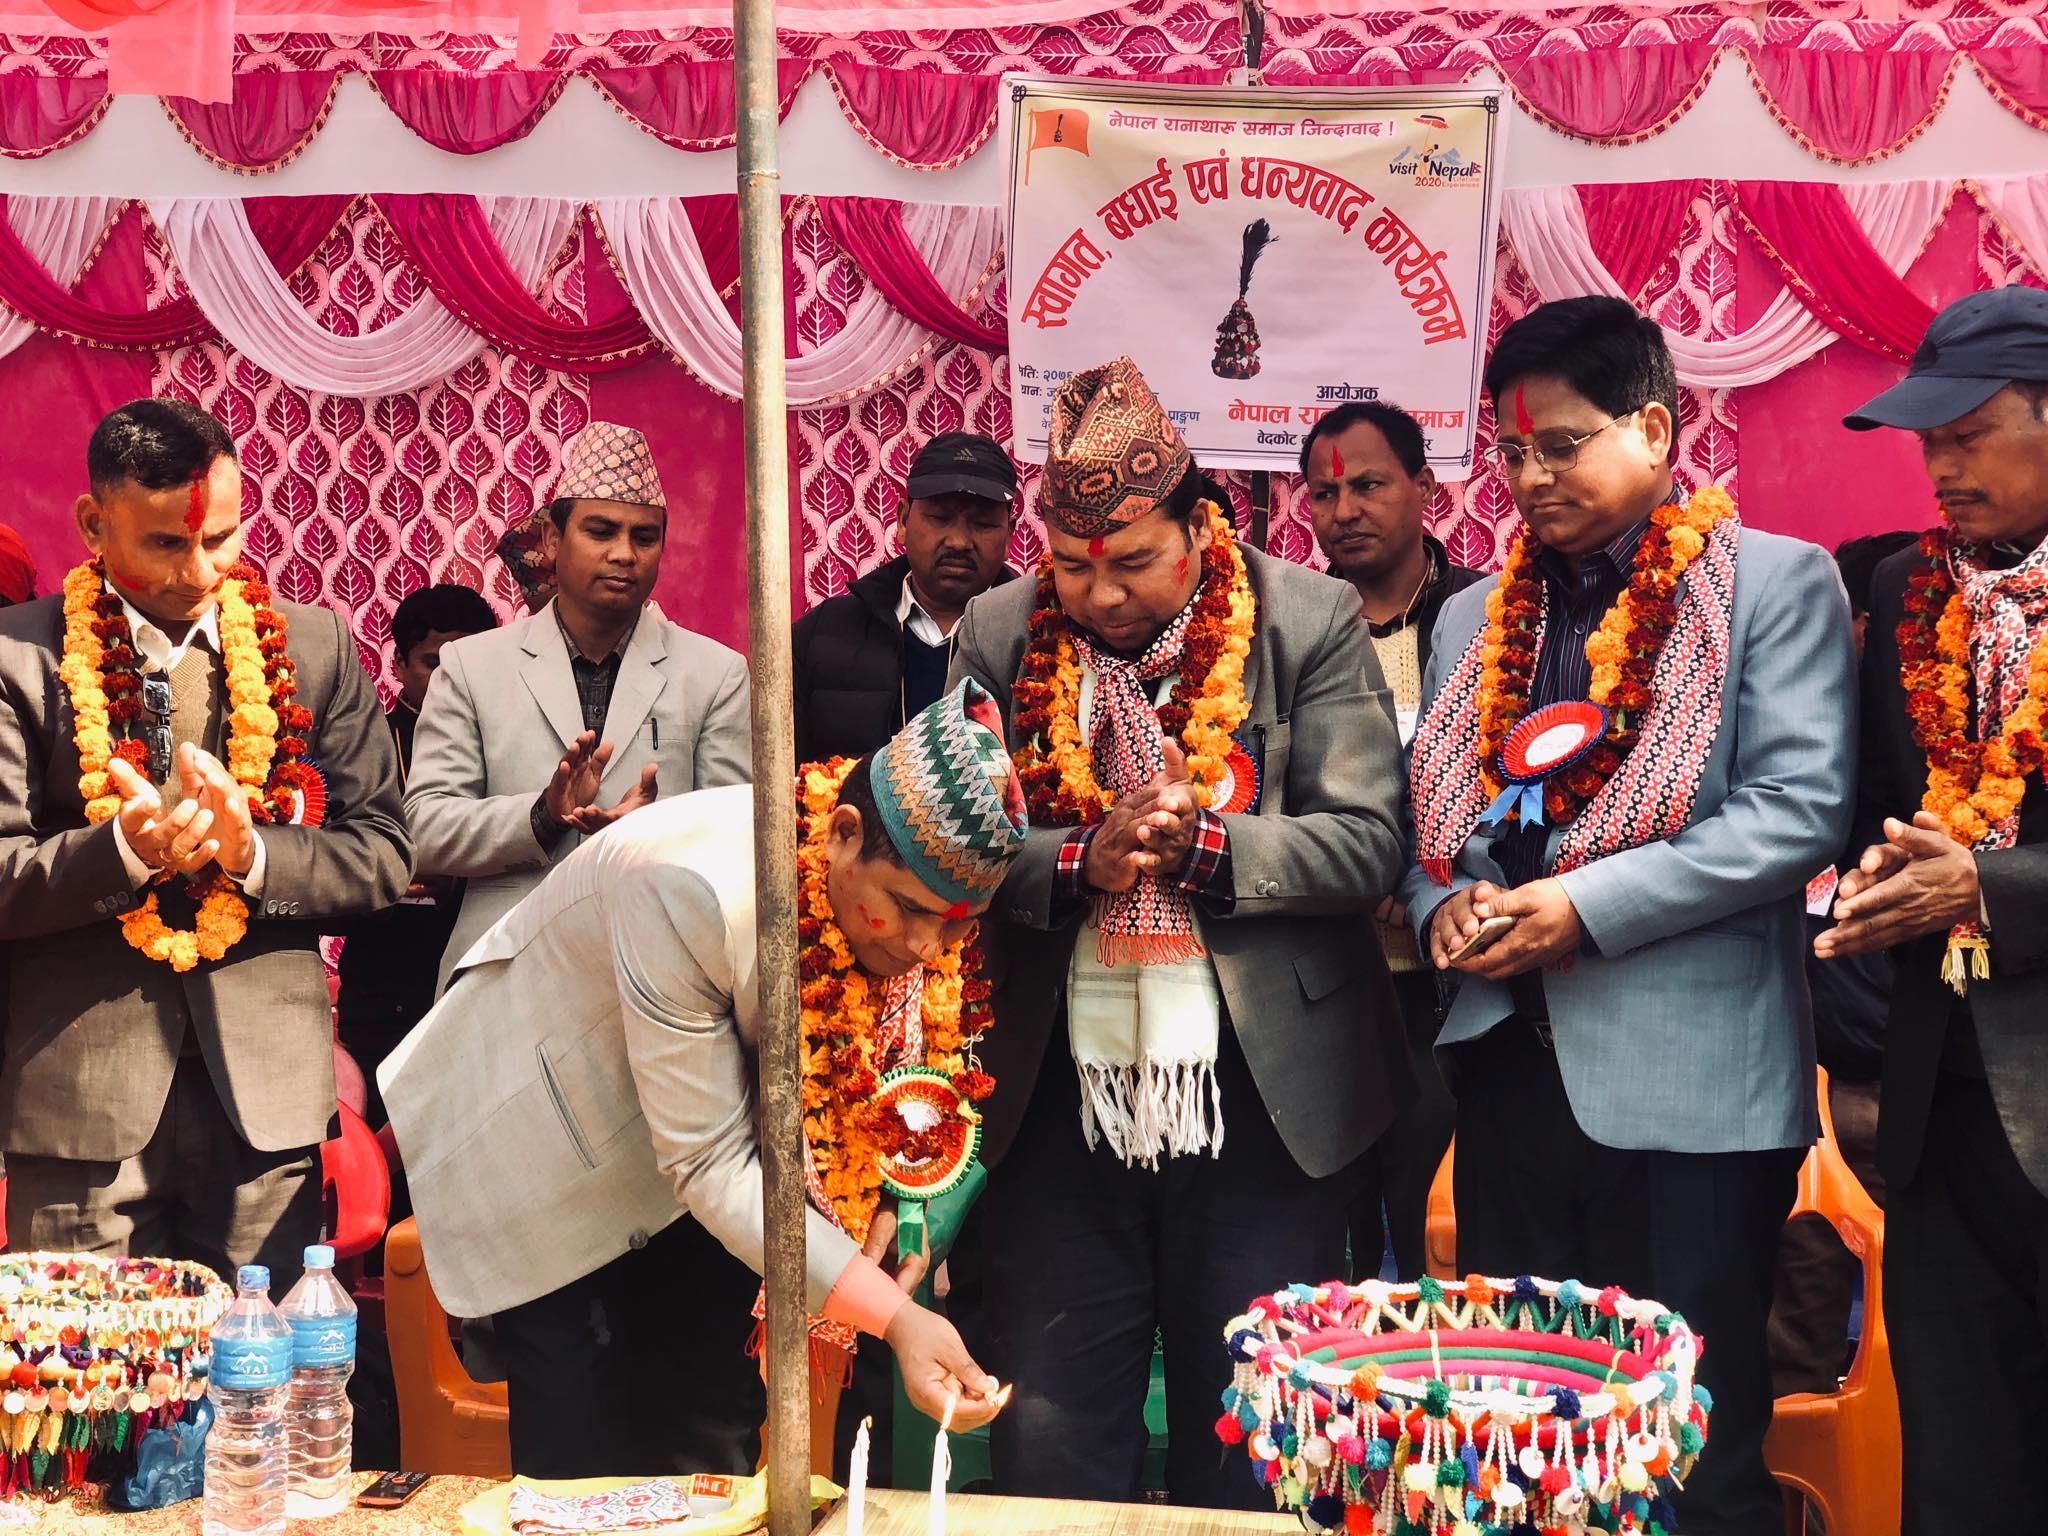 अलग जातमे सुचिकृतसे खुशि , स्वागत करत रानाथारु समुदाय